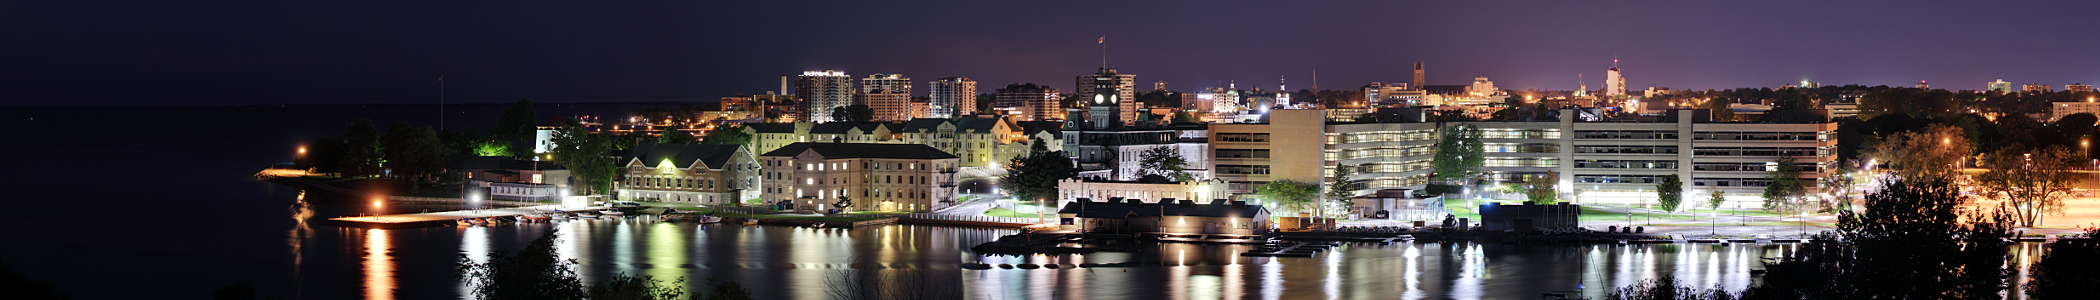 KING_Landscape_City Panorama